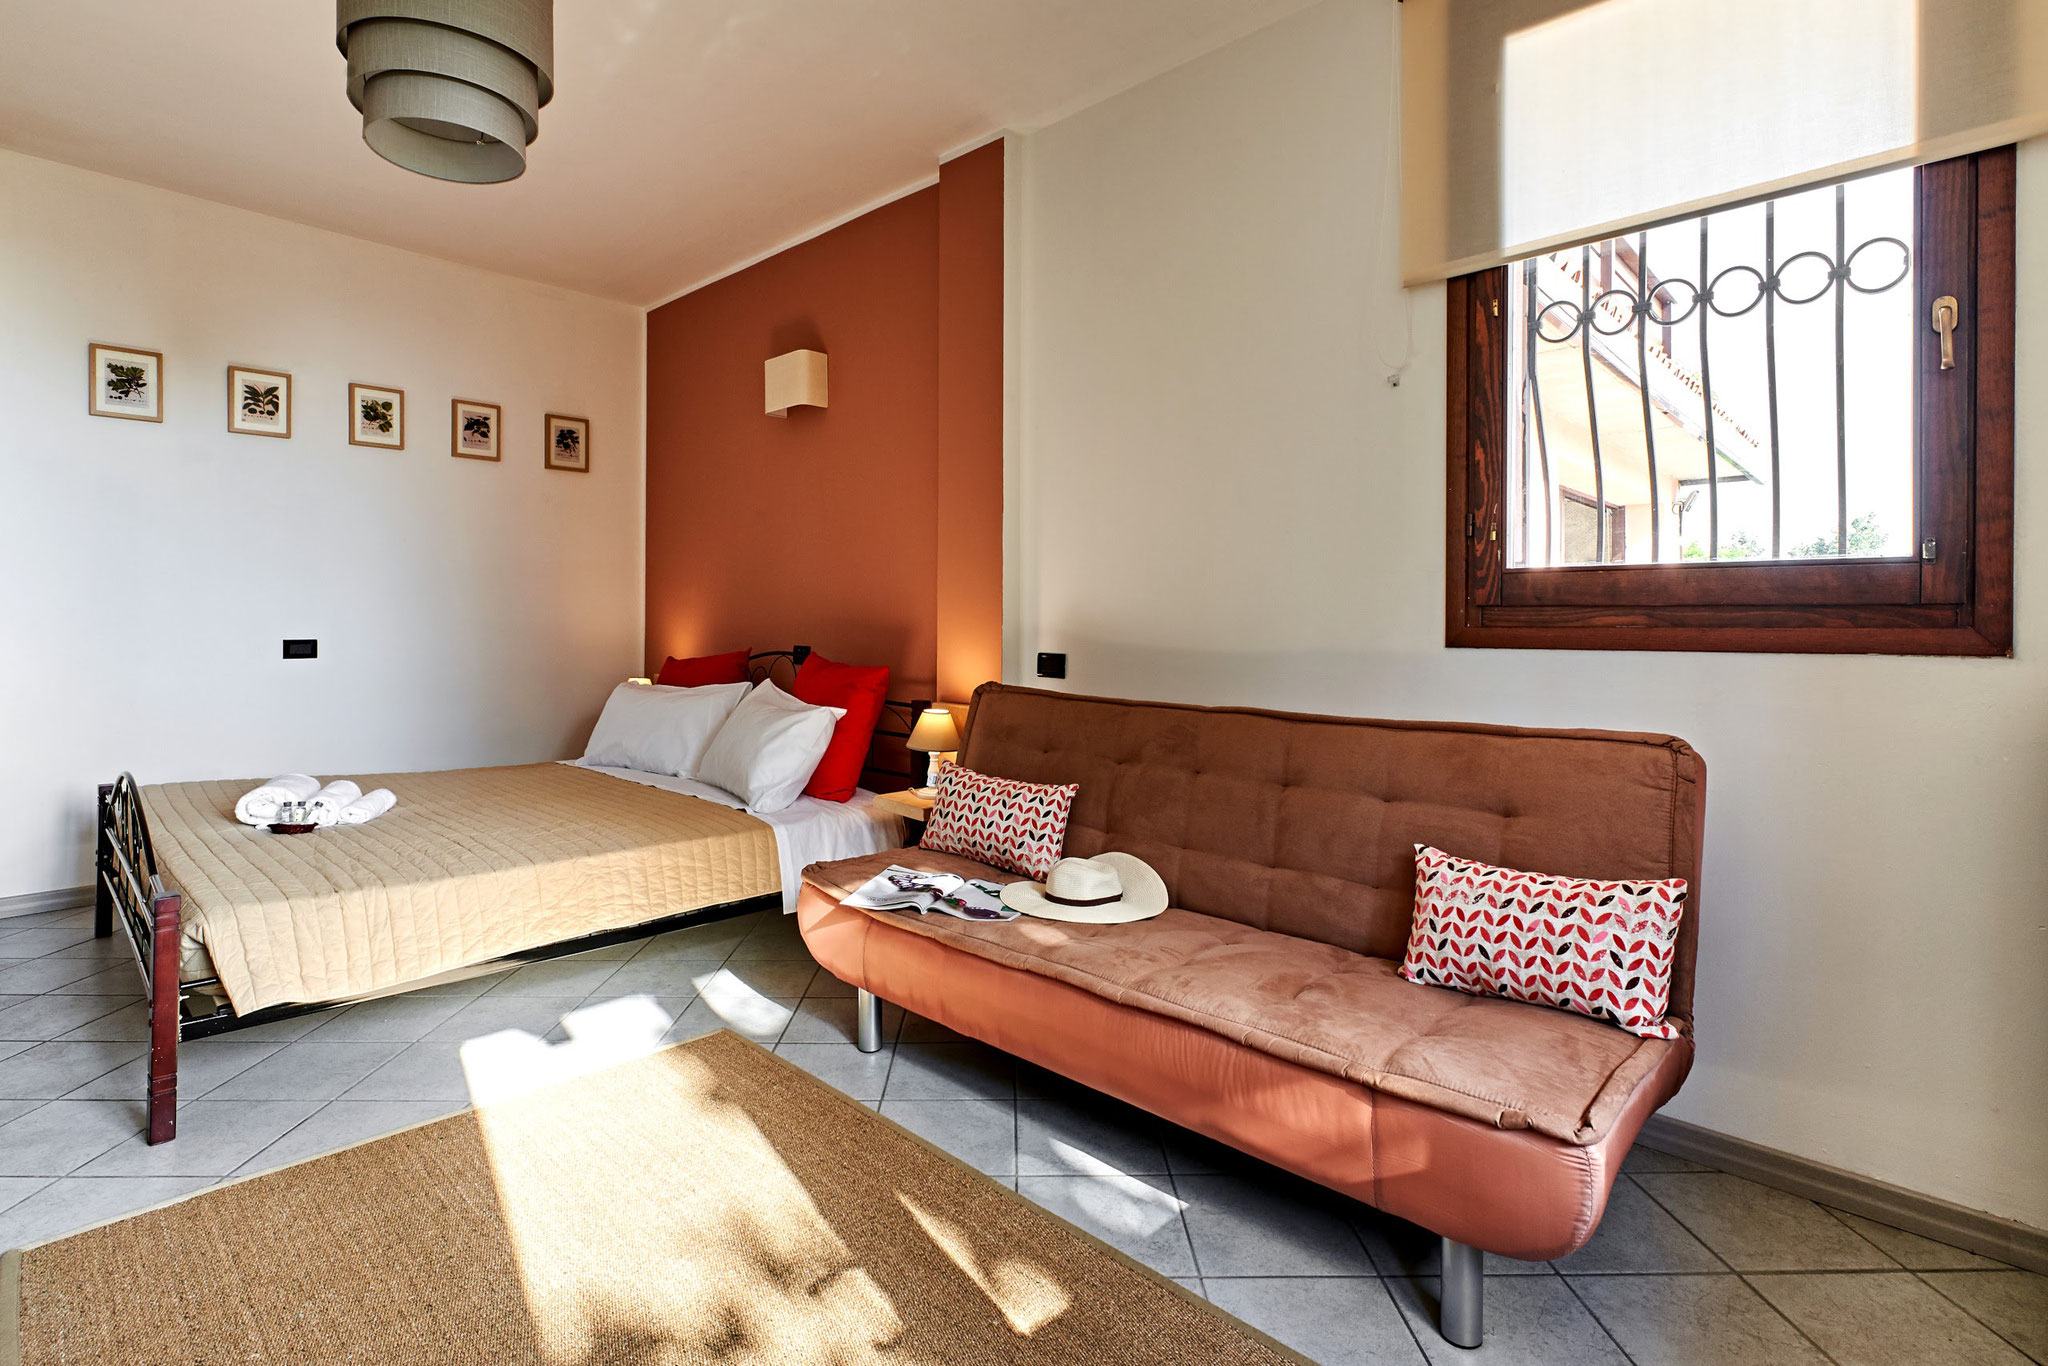 Casa San Giorgio Holiday House - Bedroom Holiday House AIR BNB Bed Breakfast